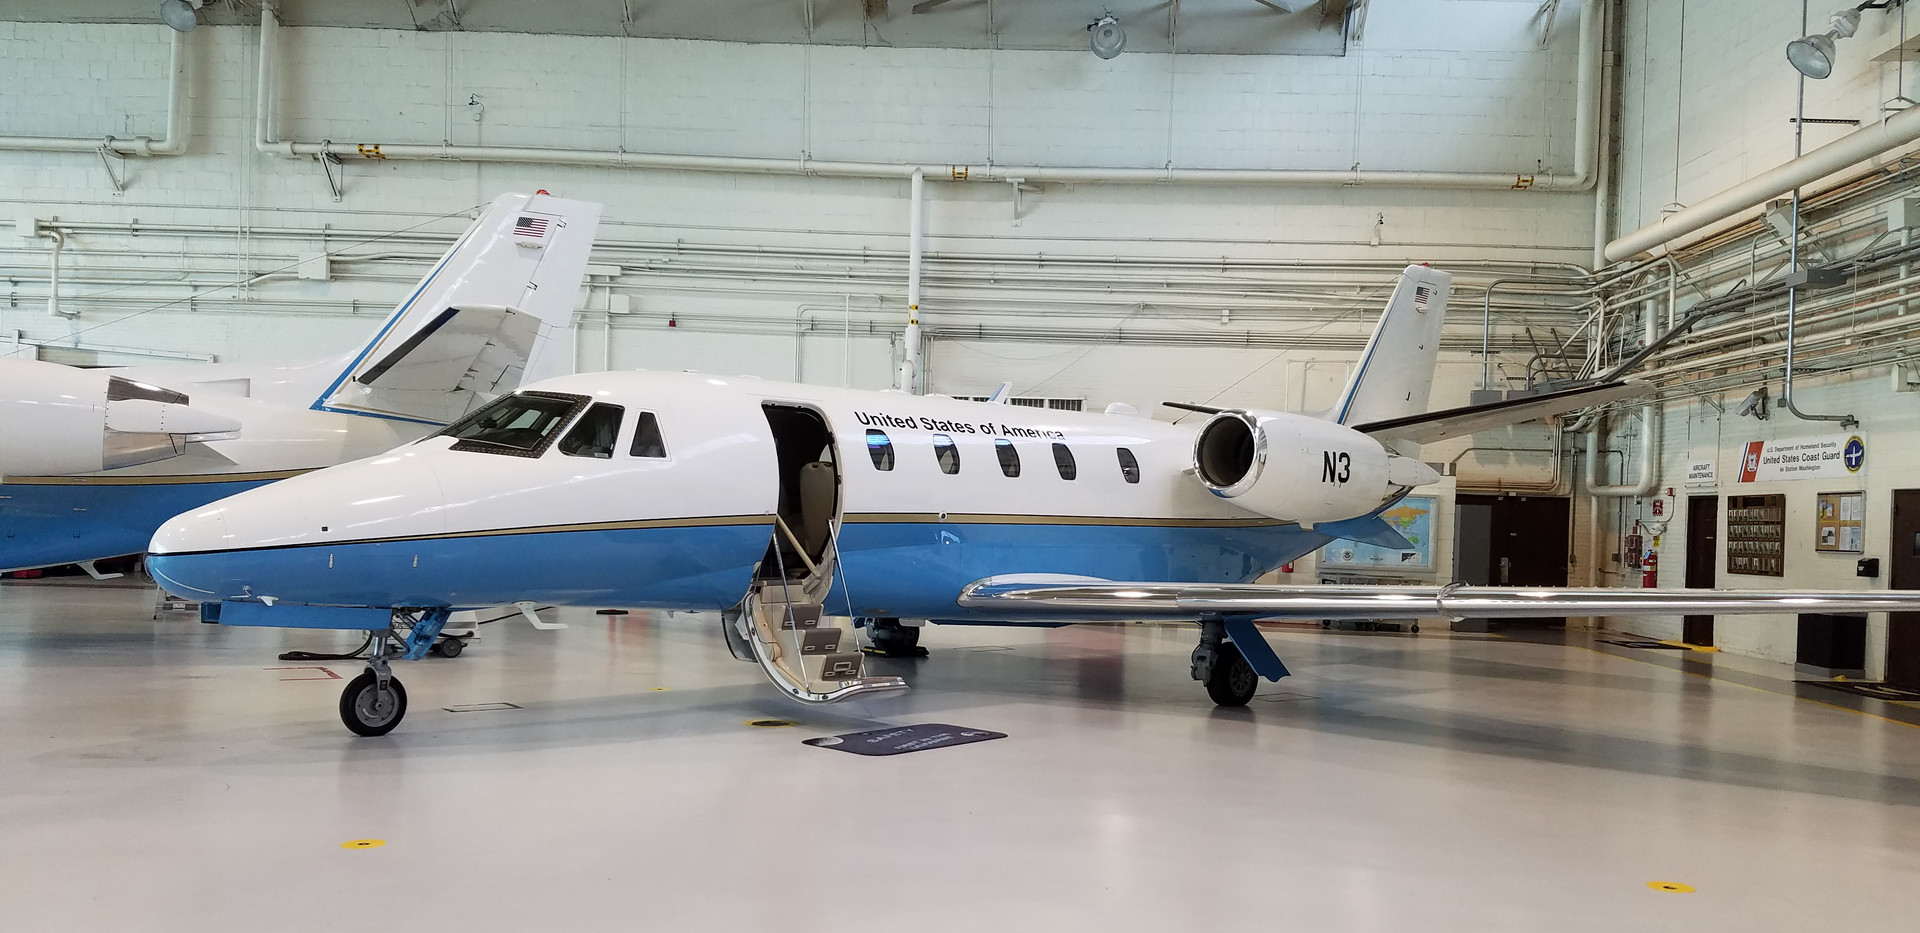 FAA N3